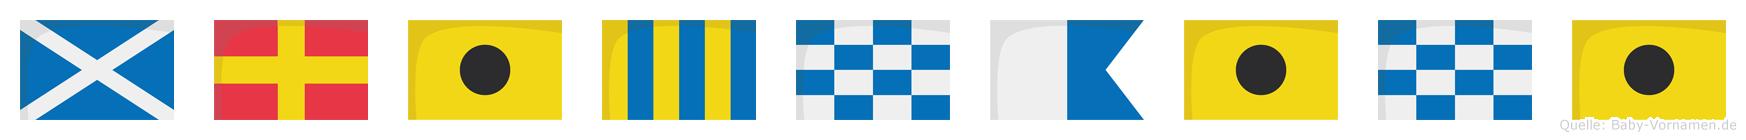 Mrignaini im Flaggenalphabet